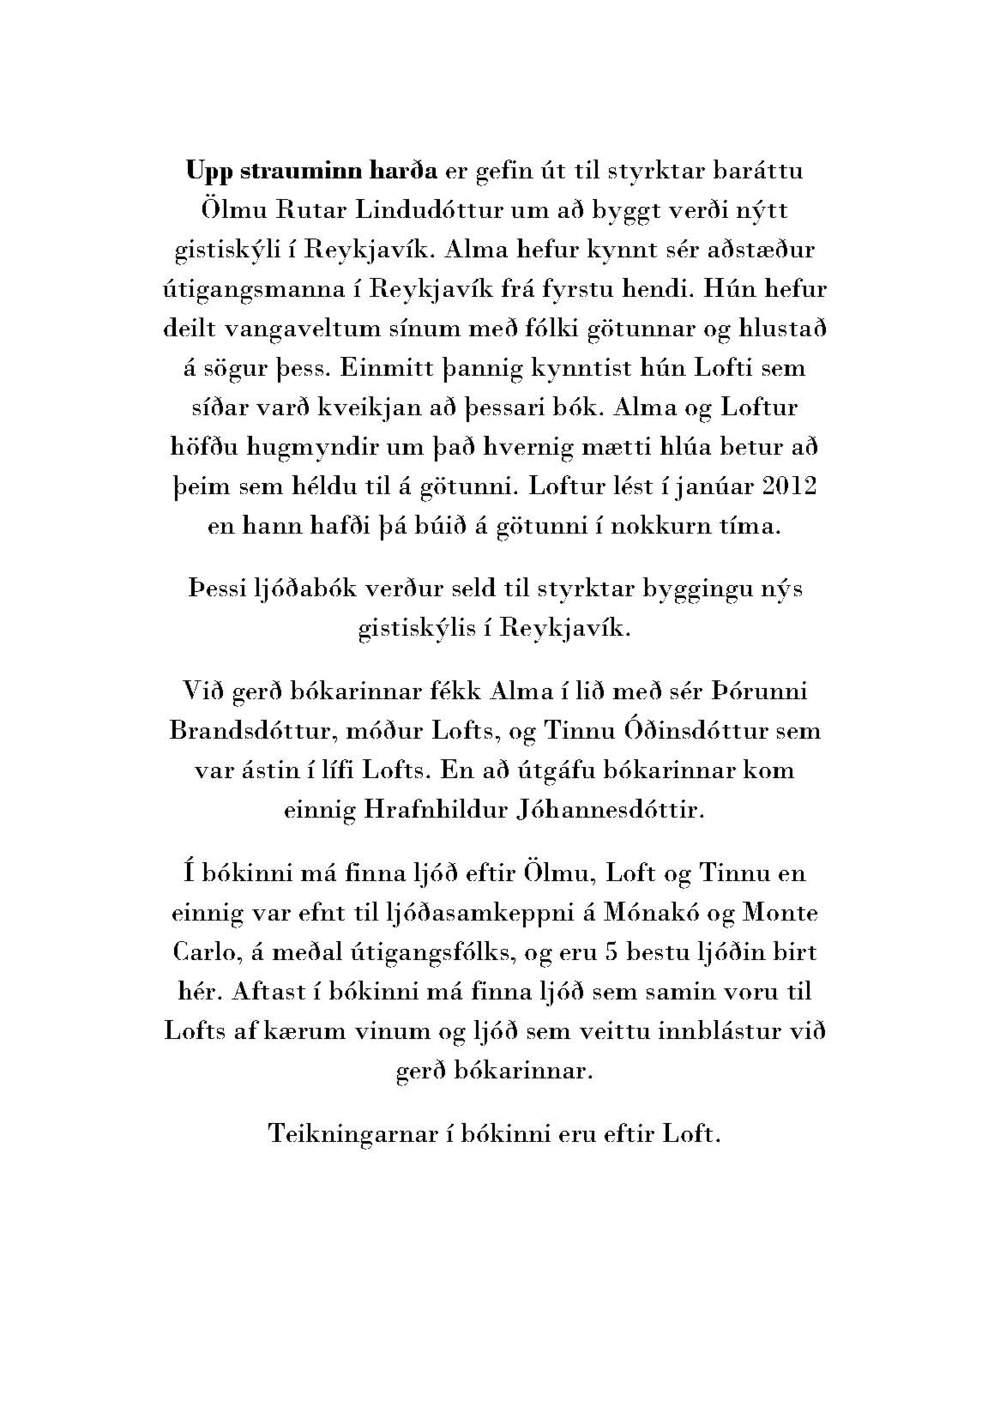 27073-ljodabokin--oll_Page_07.jpg